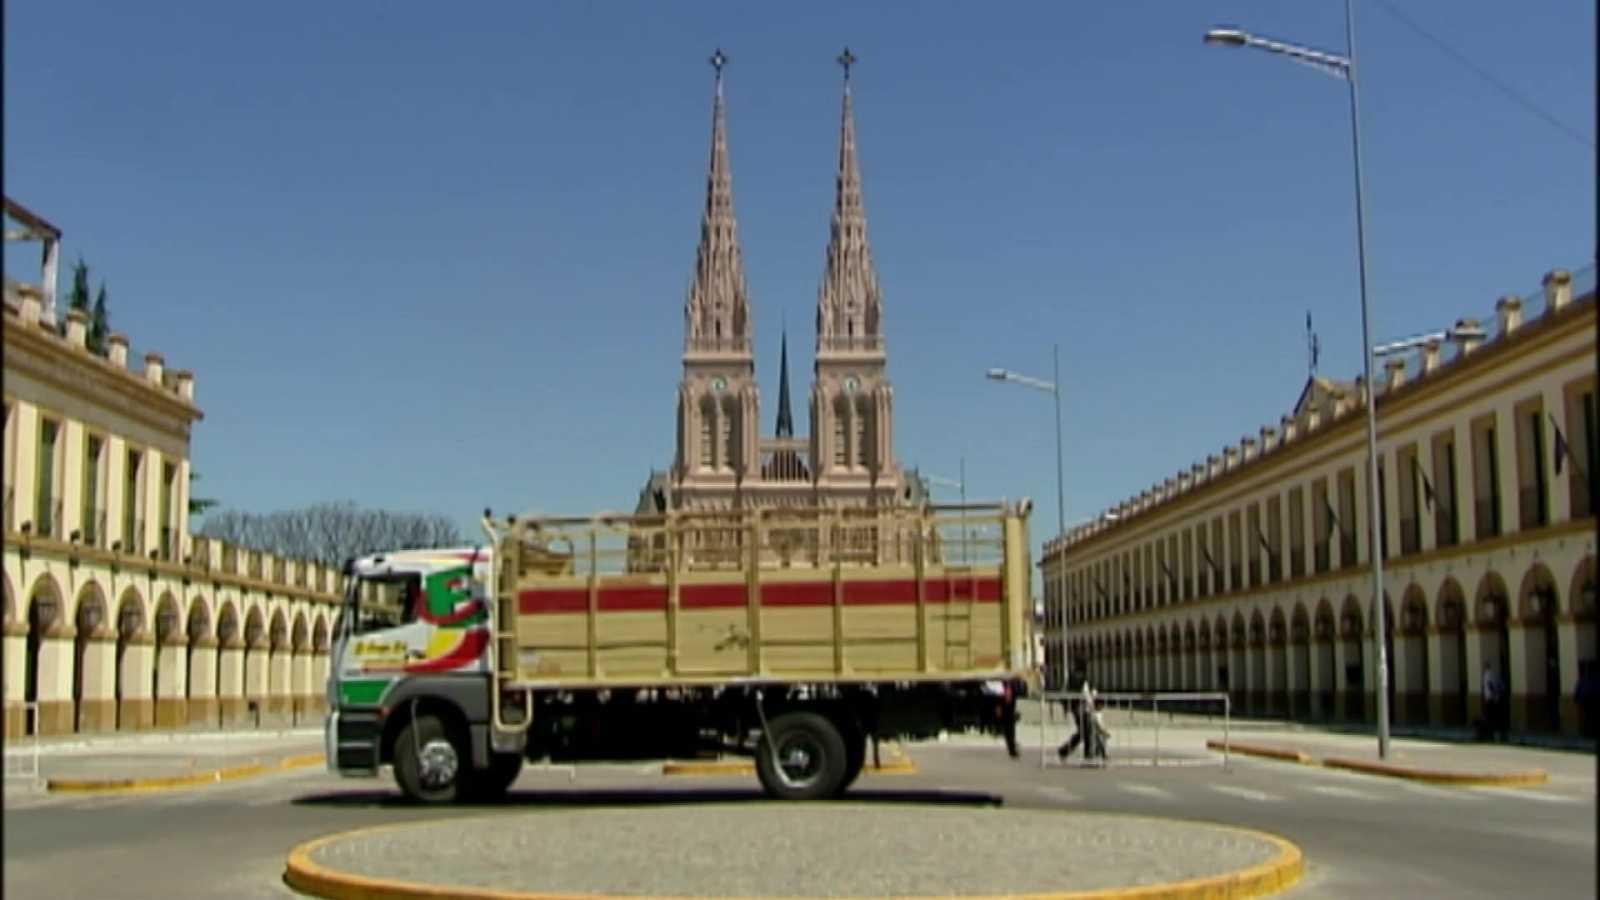 Trucks. Estrellas en la carretera - Carne argentina (Argentina) - ver ahora